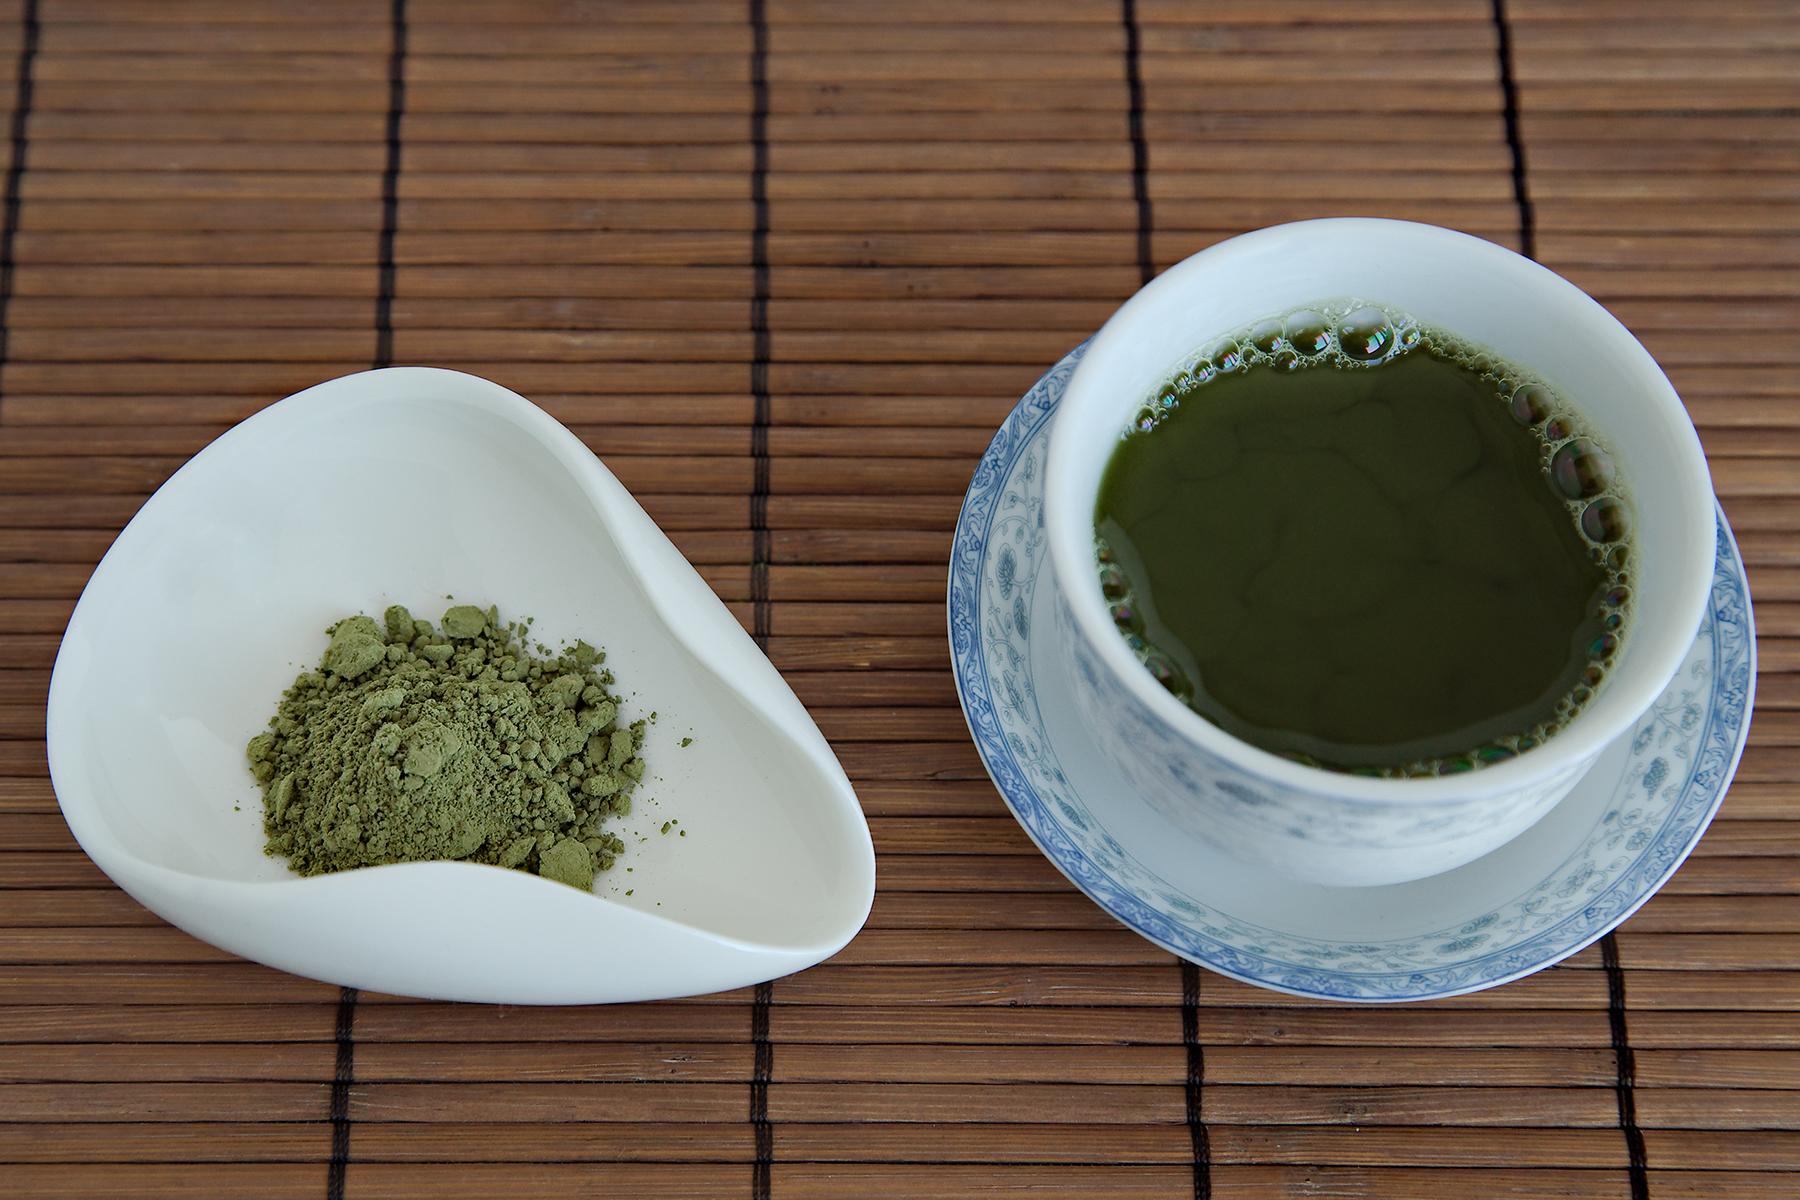 Red Leaf Tea – 100% Organic Starter Matcha, Culinary Grade